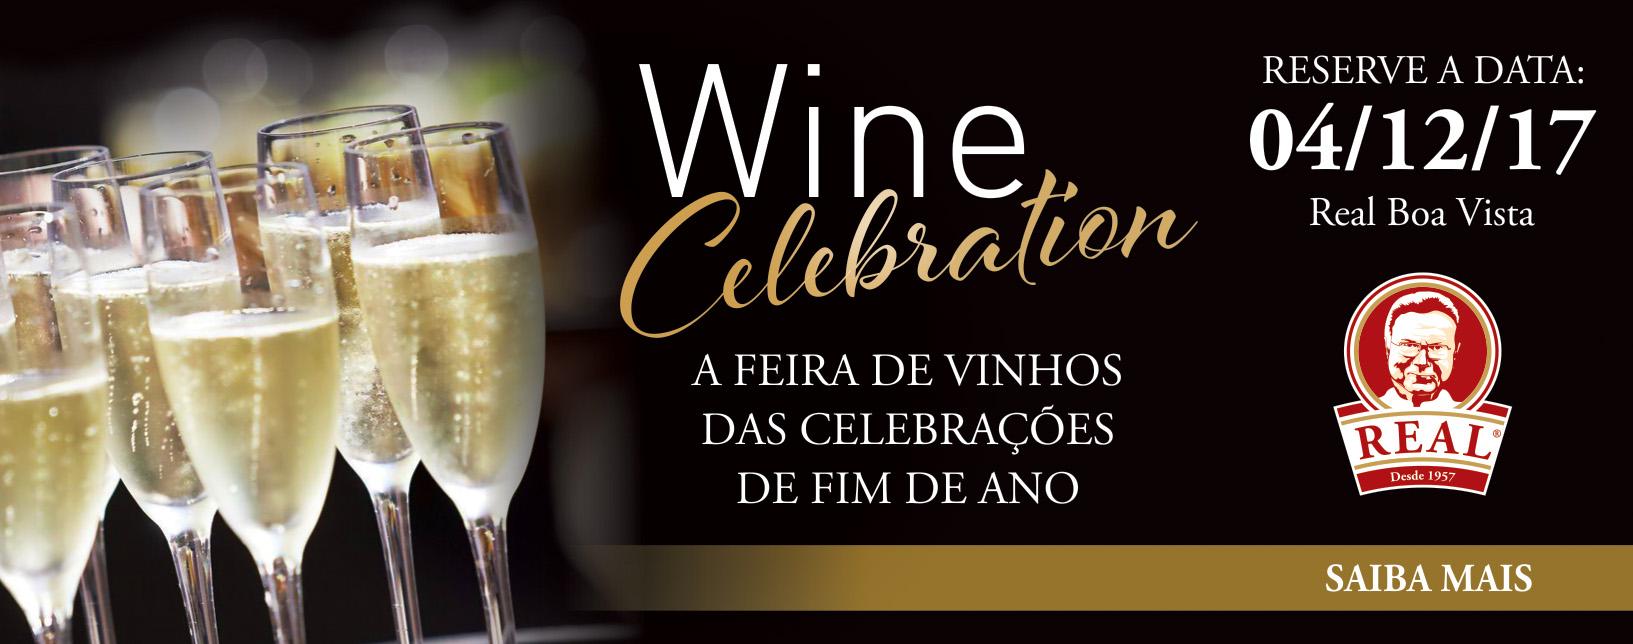 Wine_Celebration_Padaria_Real_s